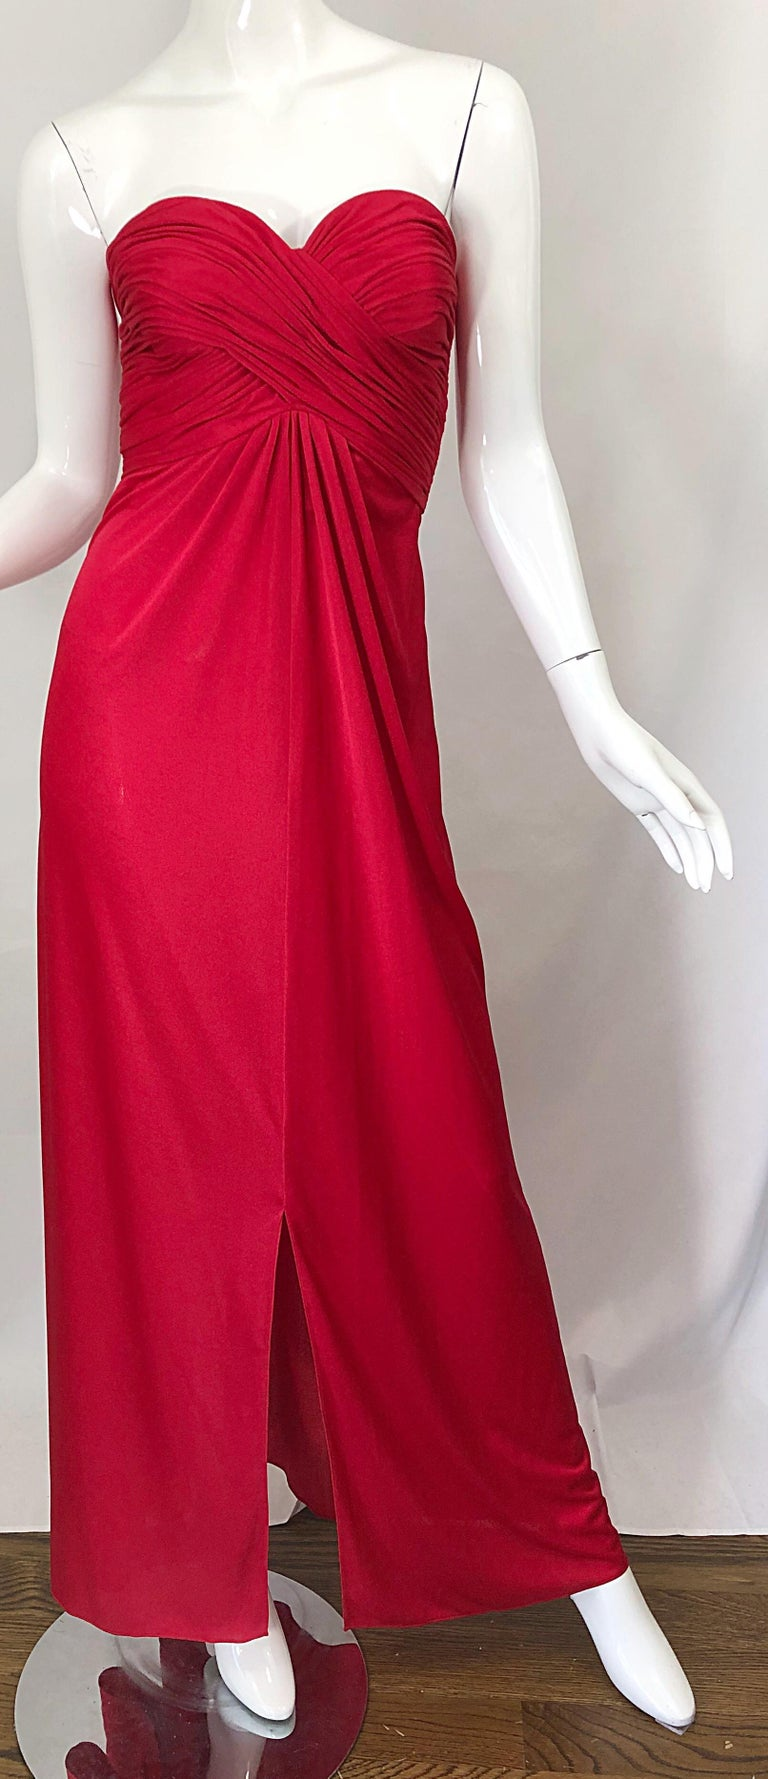 1970s Luis Estevez Silk Jersey Lipstick Red Strapless Vintage 70s Grecian Gown For Sale 4